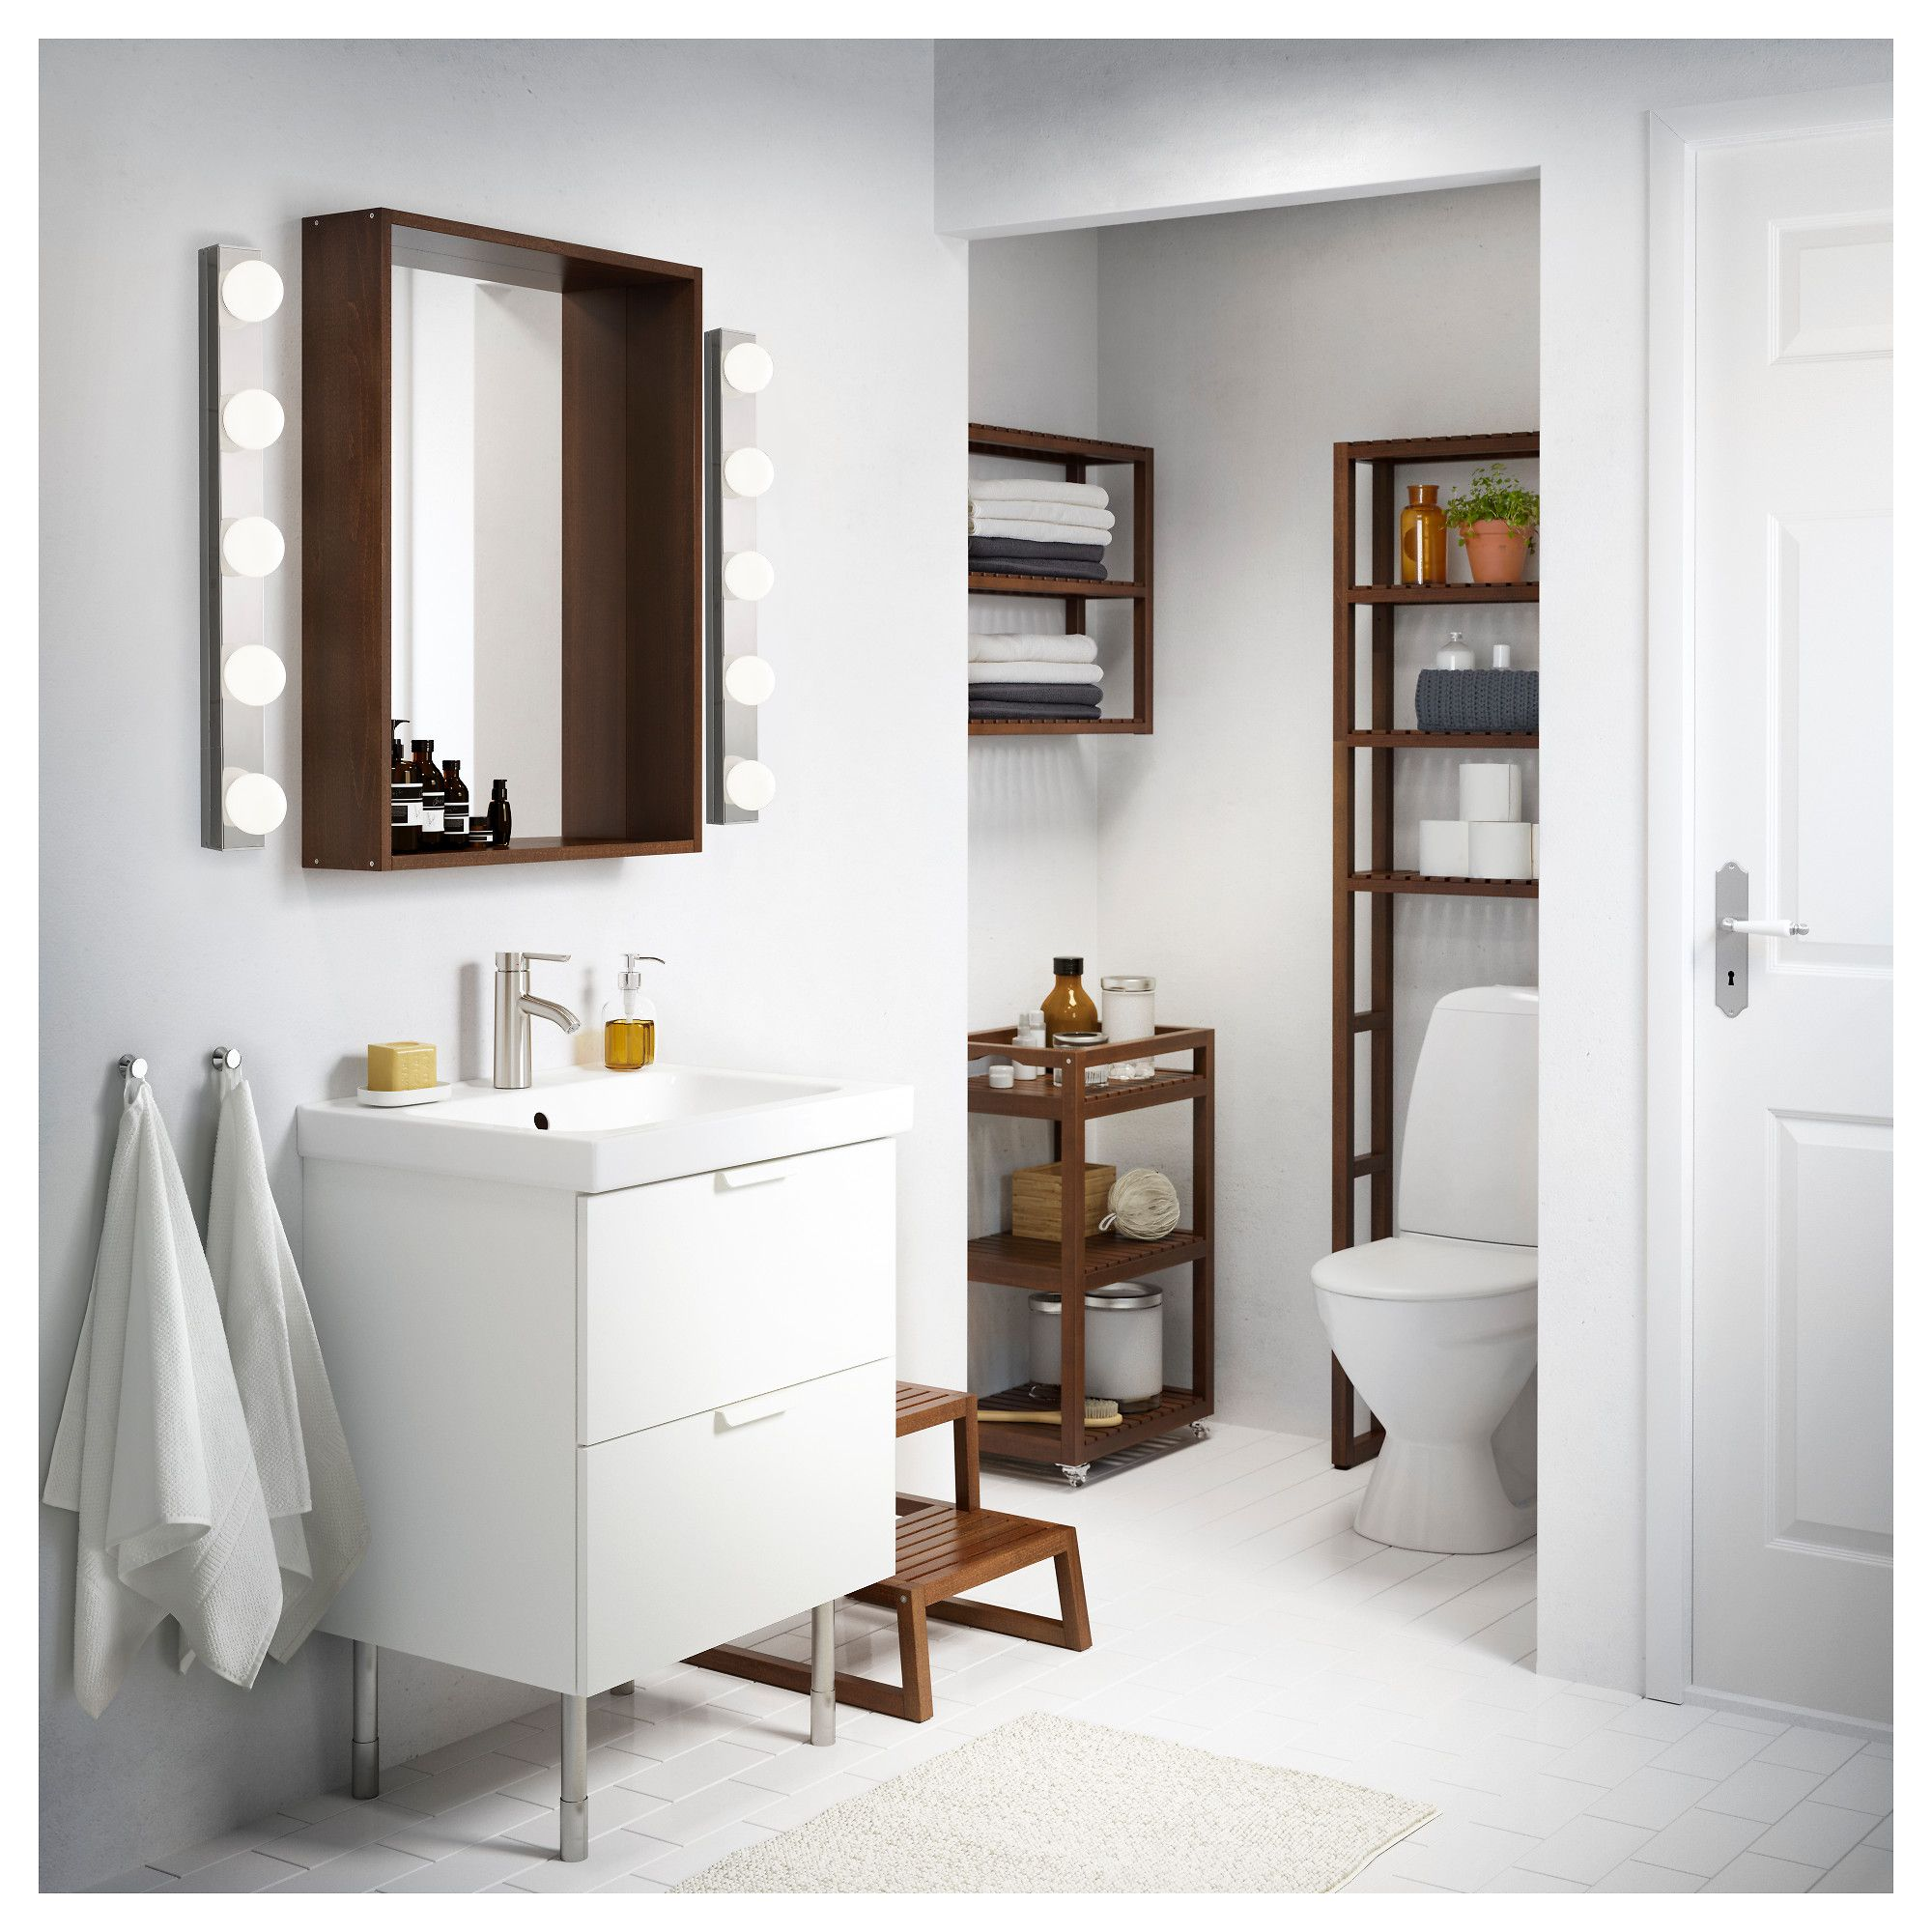 Furniture and Home Furnishings Ikea bathroom, Small